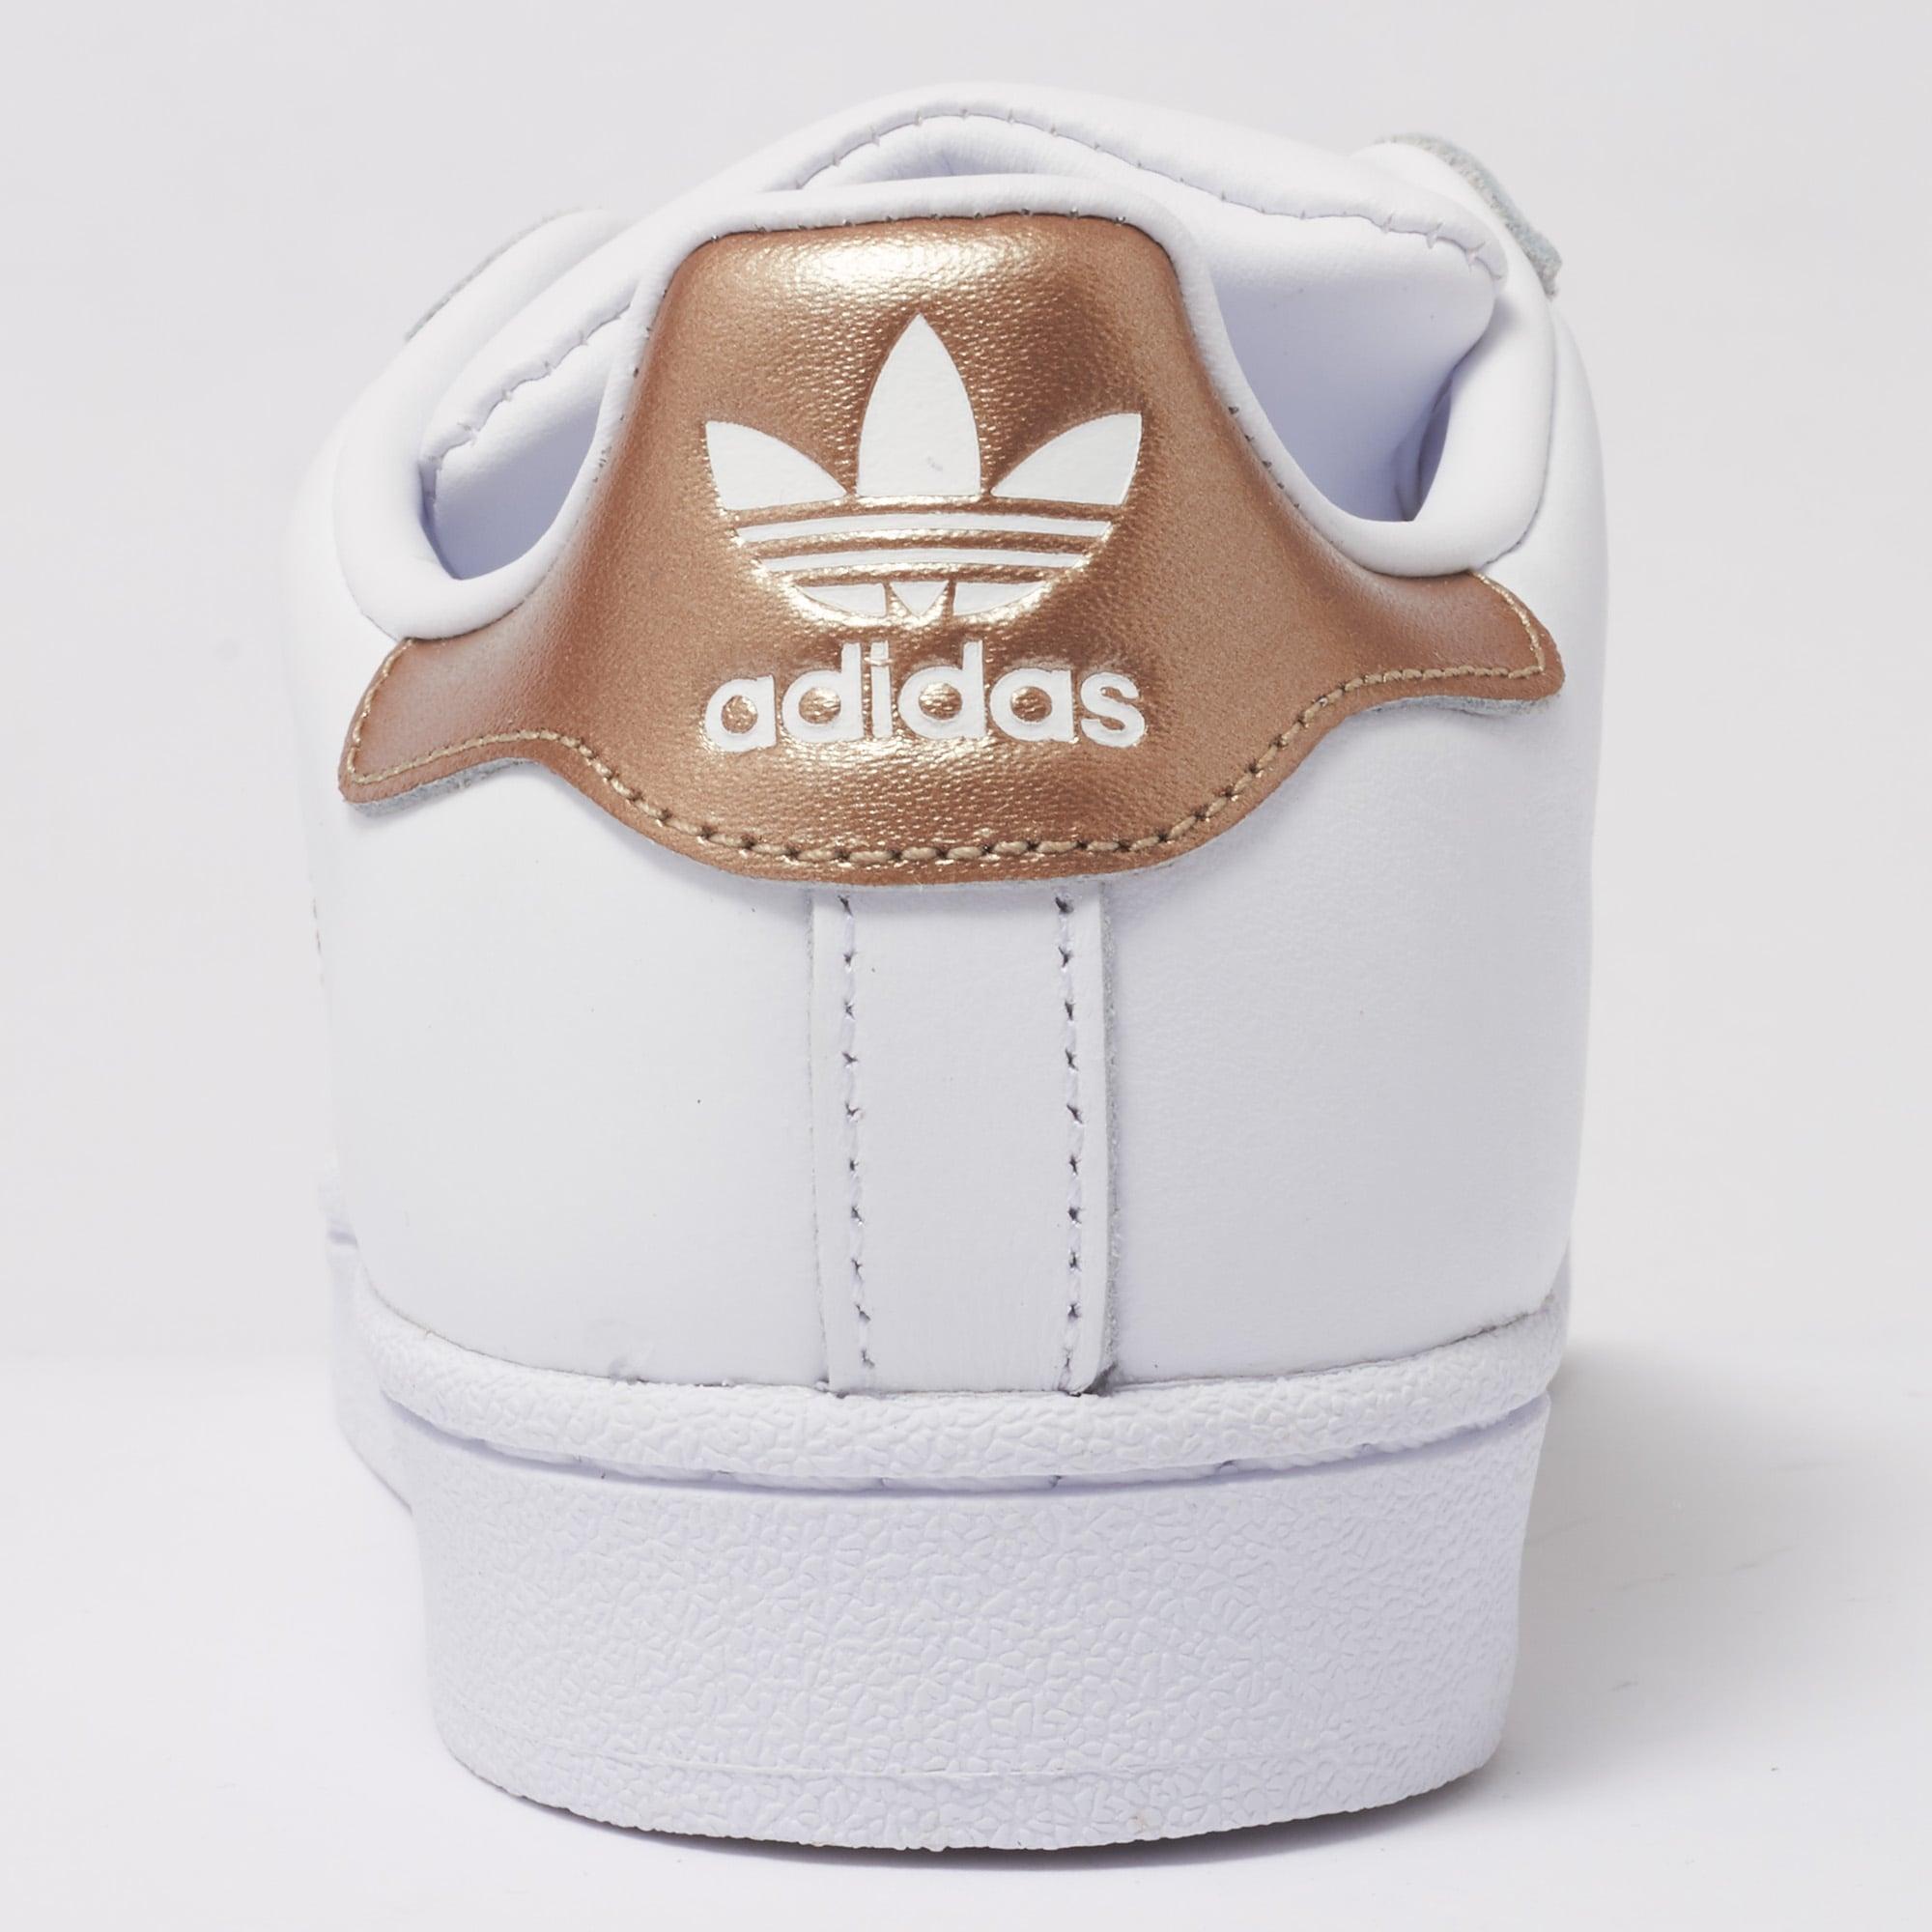 Adidas Originals Womens Womens Superstar Trainers - White & Cyber Metallic